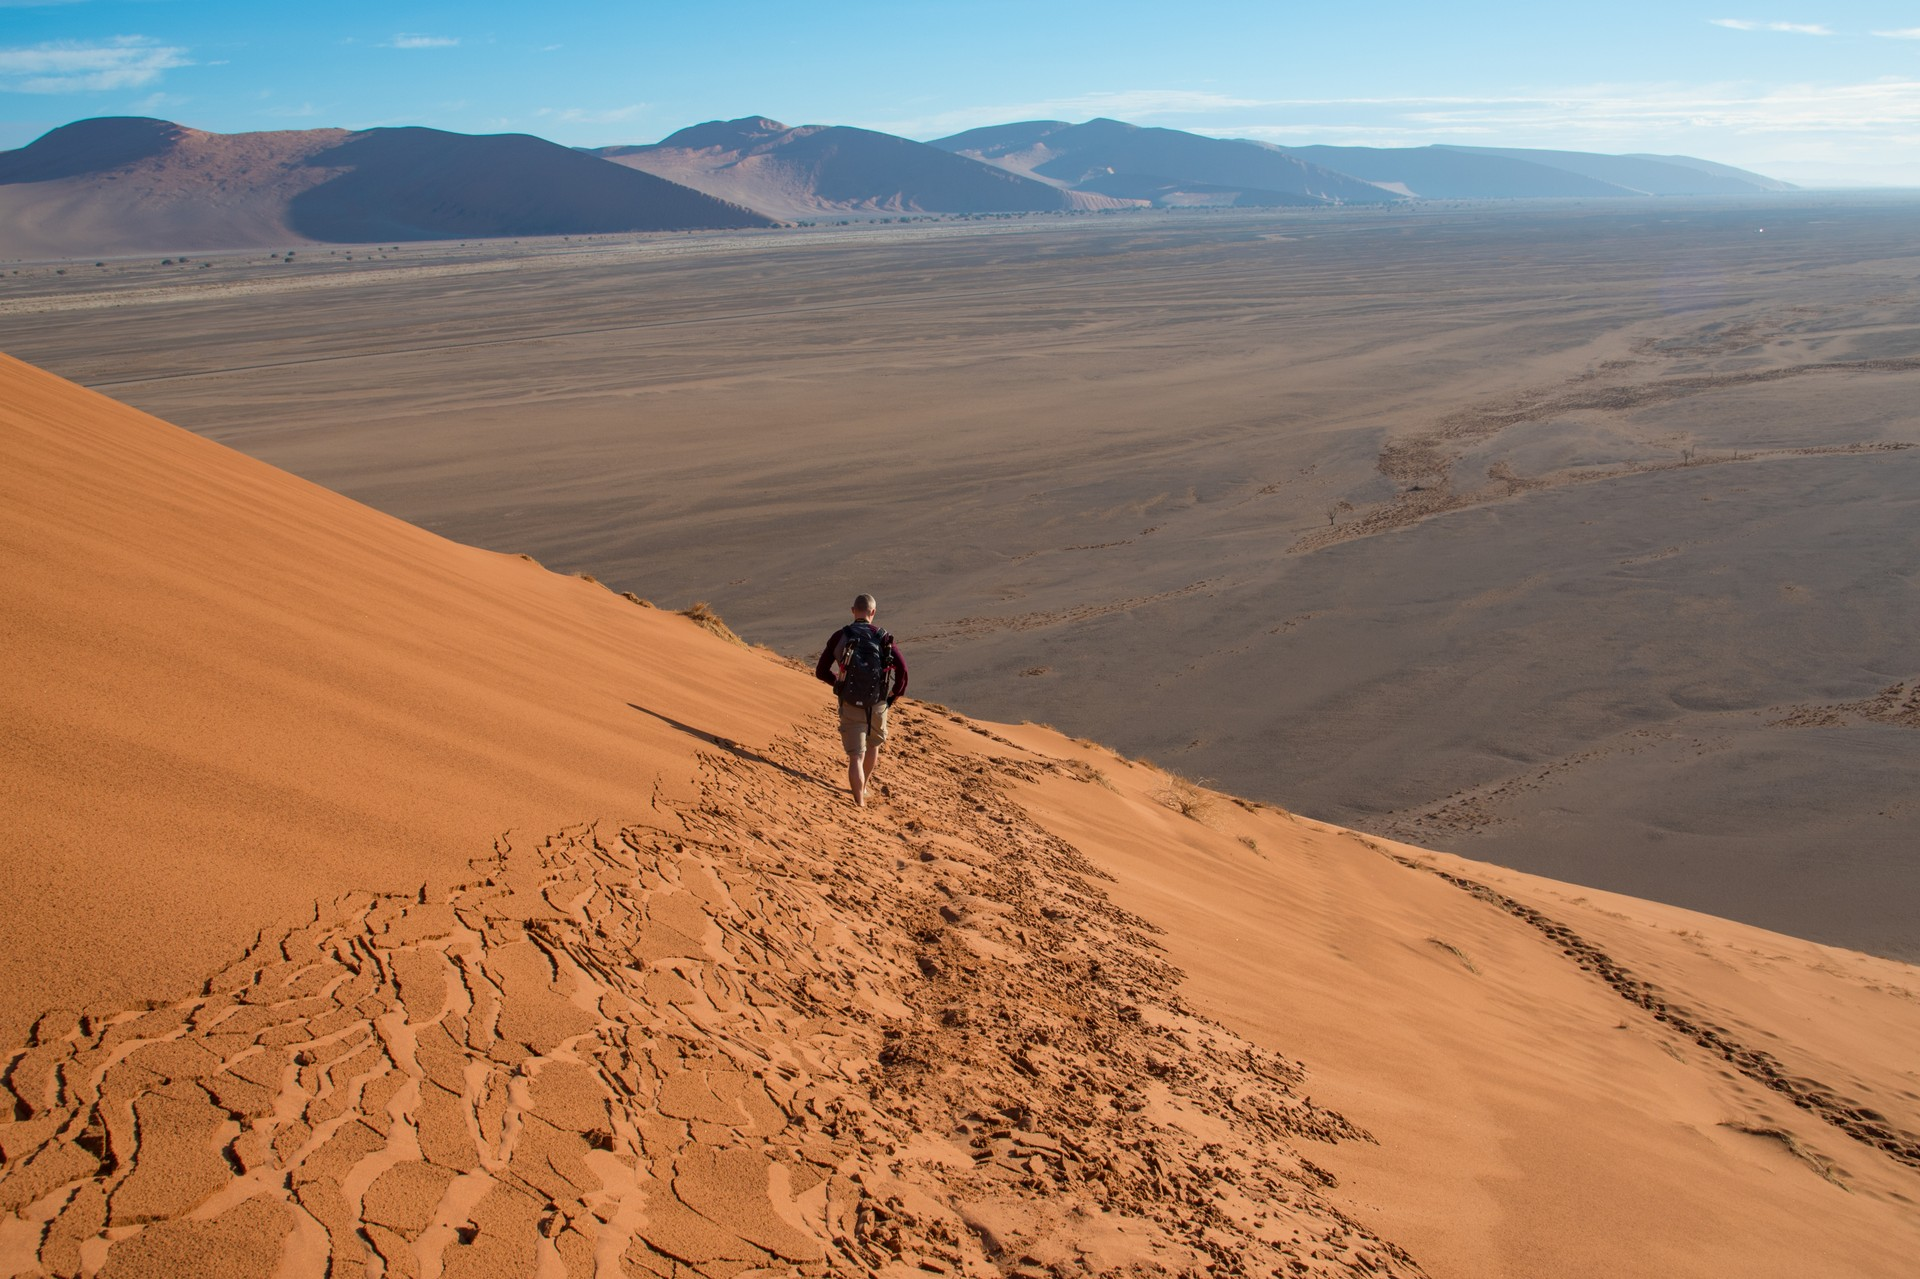 Hiking the Sossusvlei sand dunes